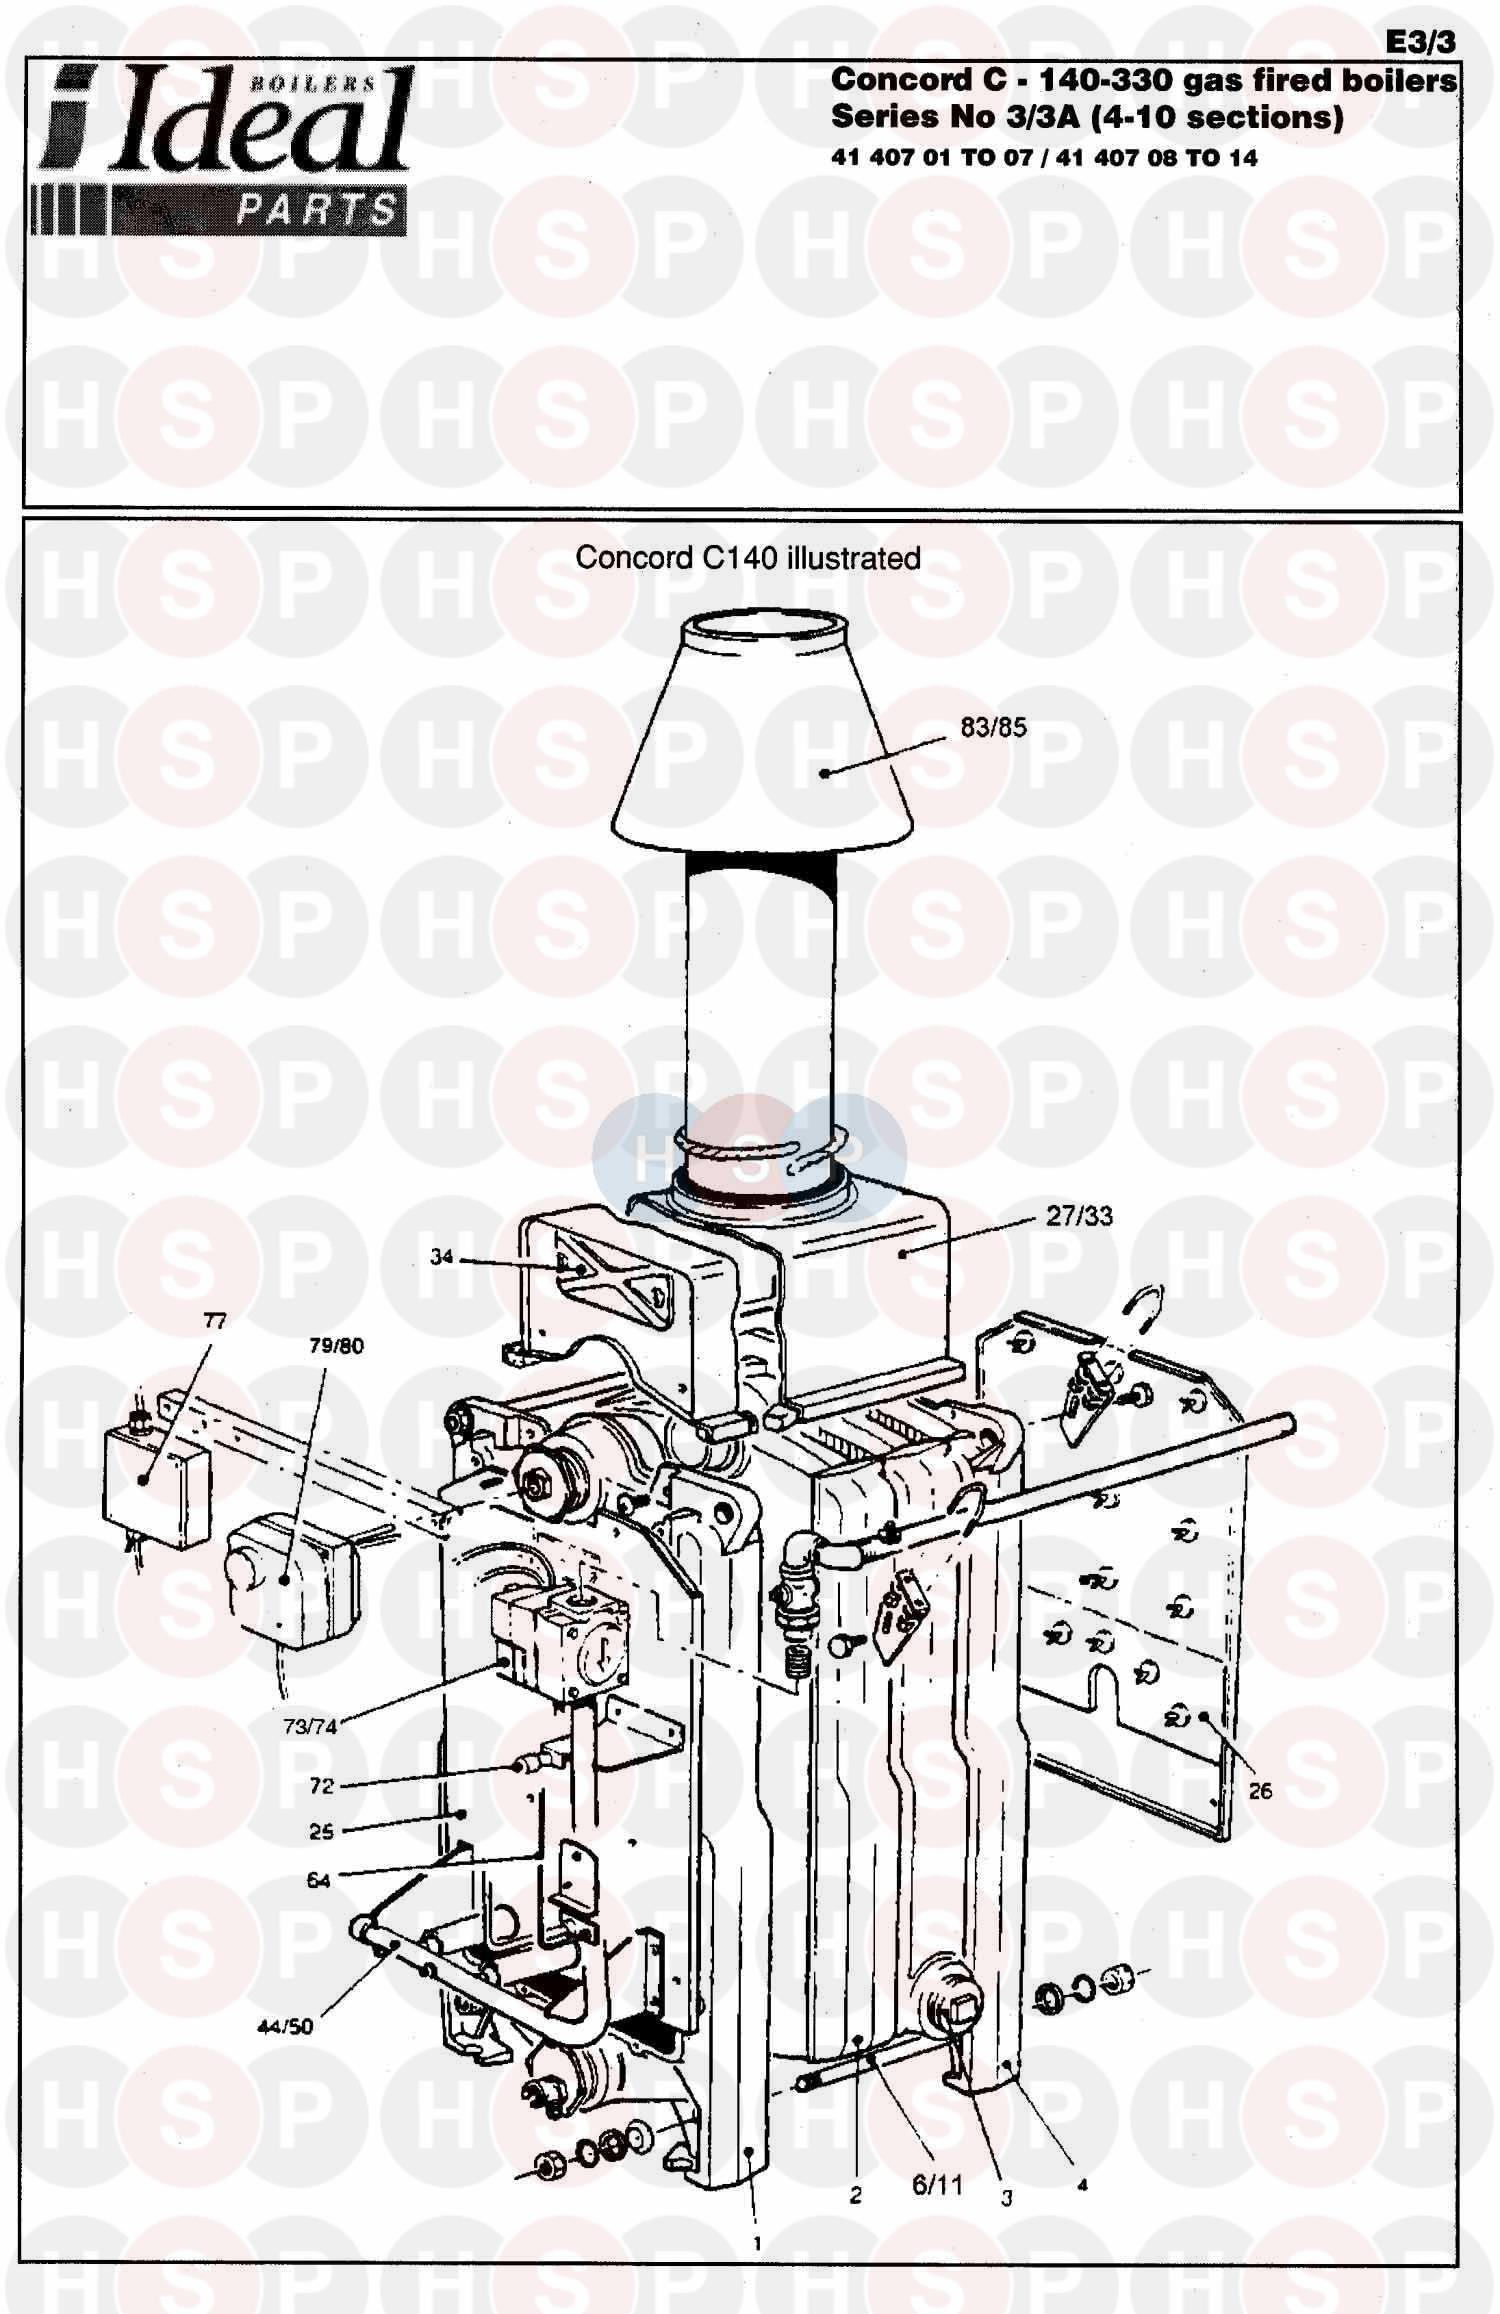 ideal concord c 3 260 boiler assembly 1 diagram. Black Bedroom Furniture Sets. Home Design Ideas